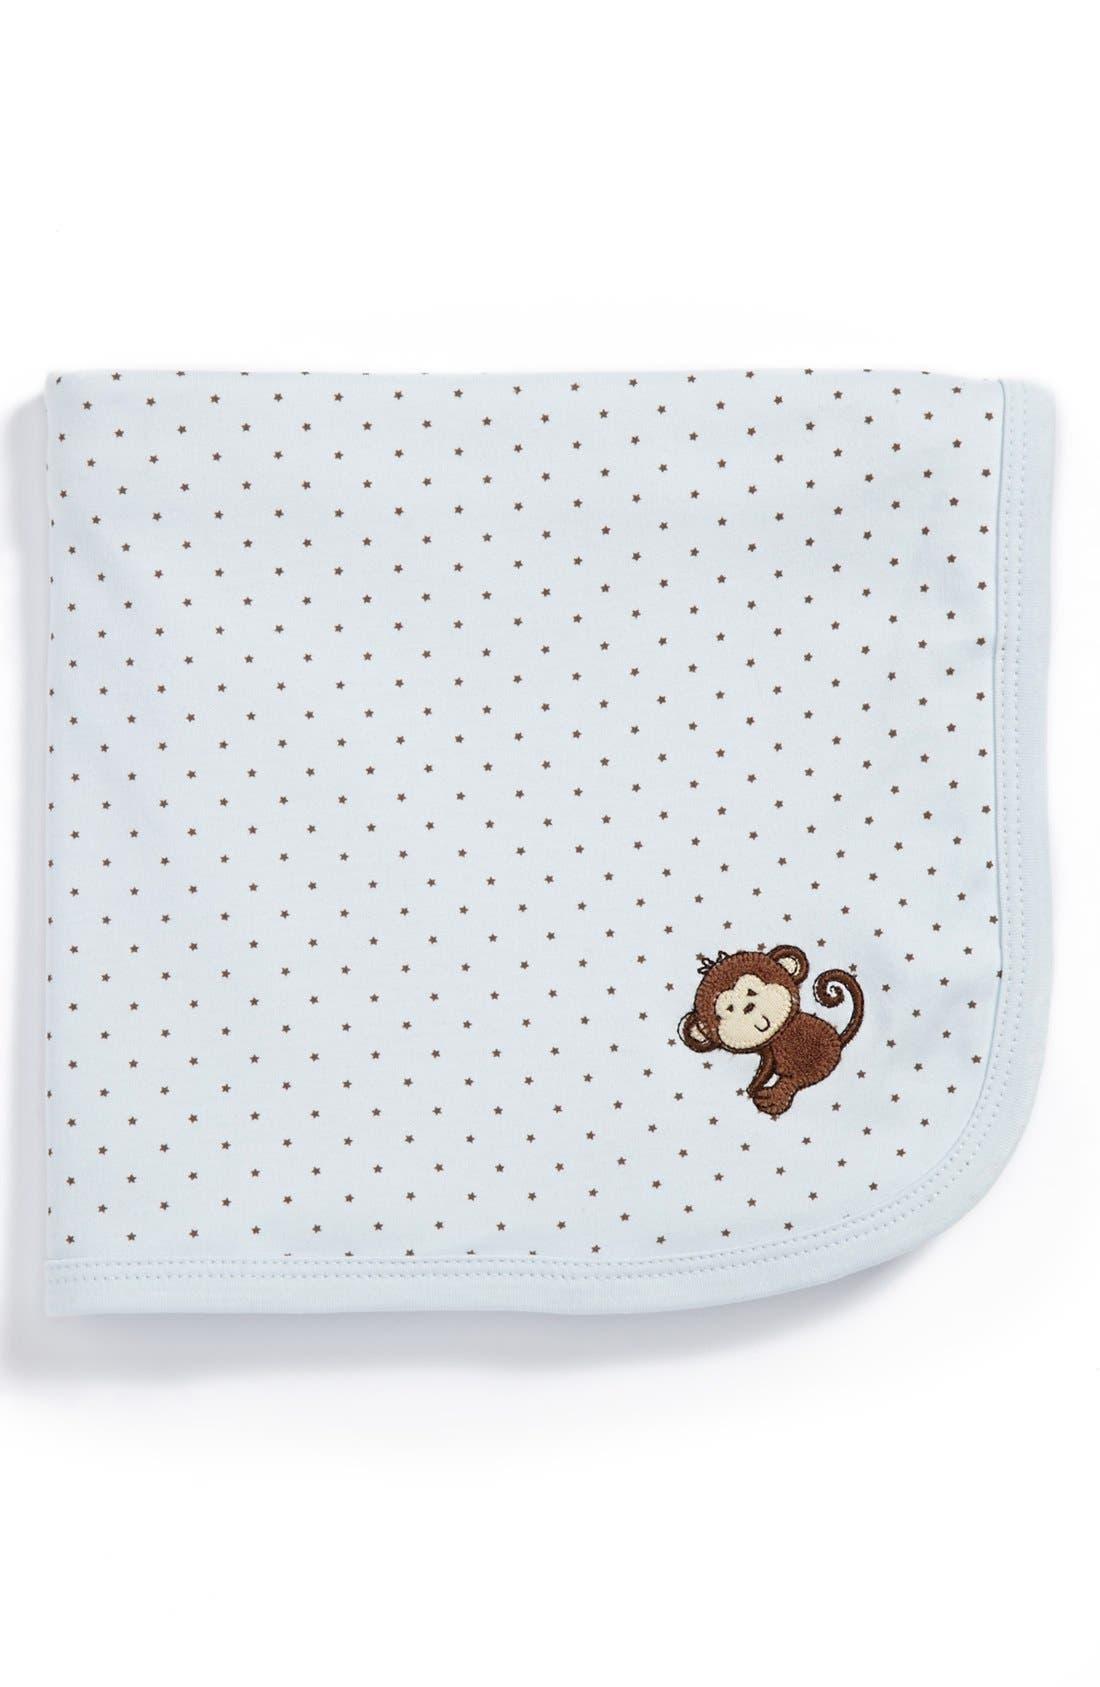 Main Image - Little Me 'Monkey Star' Receiving Blanket